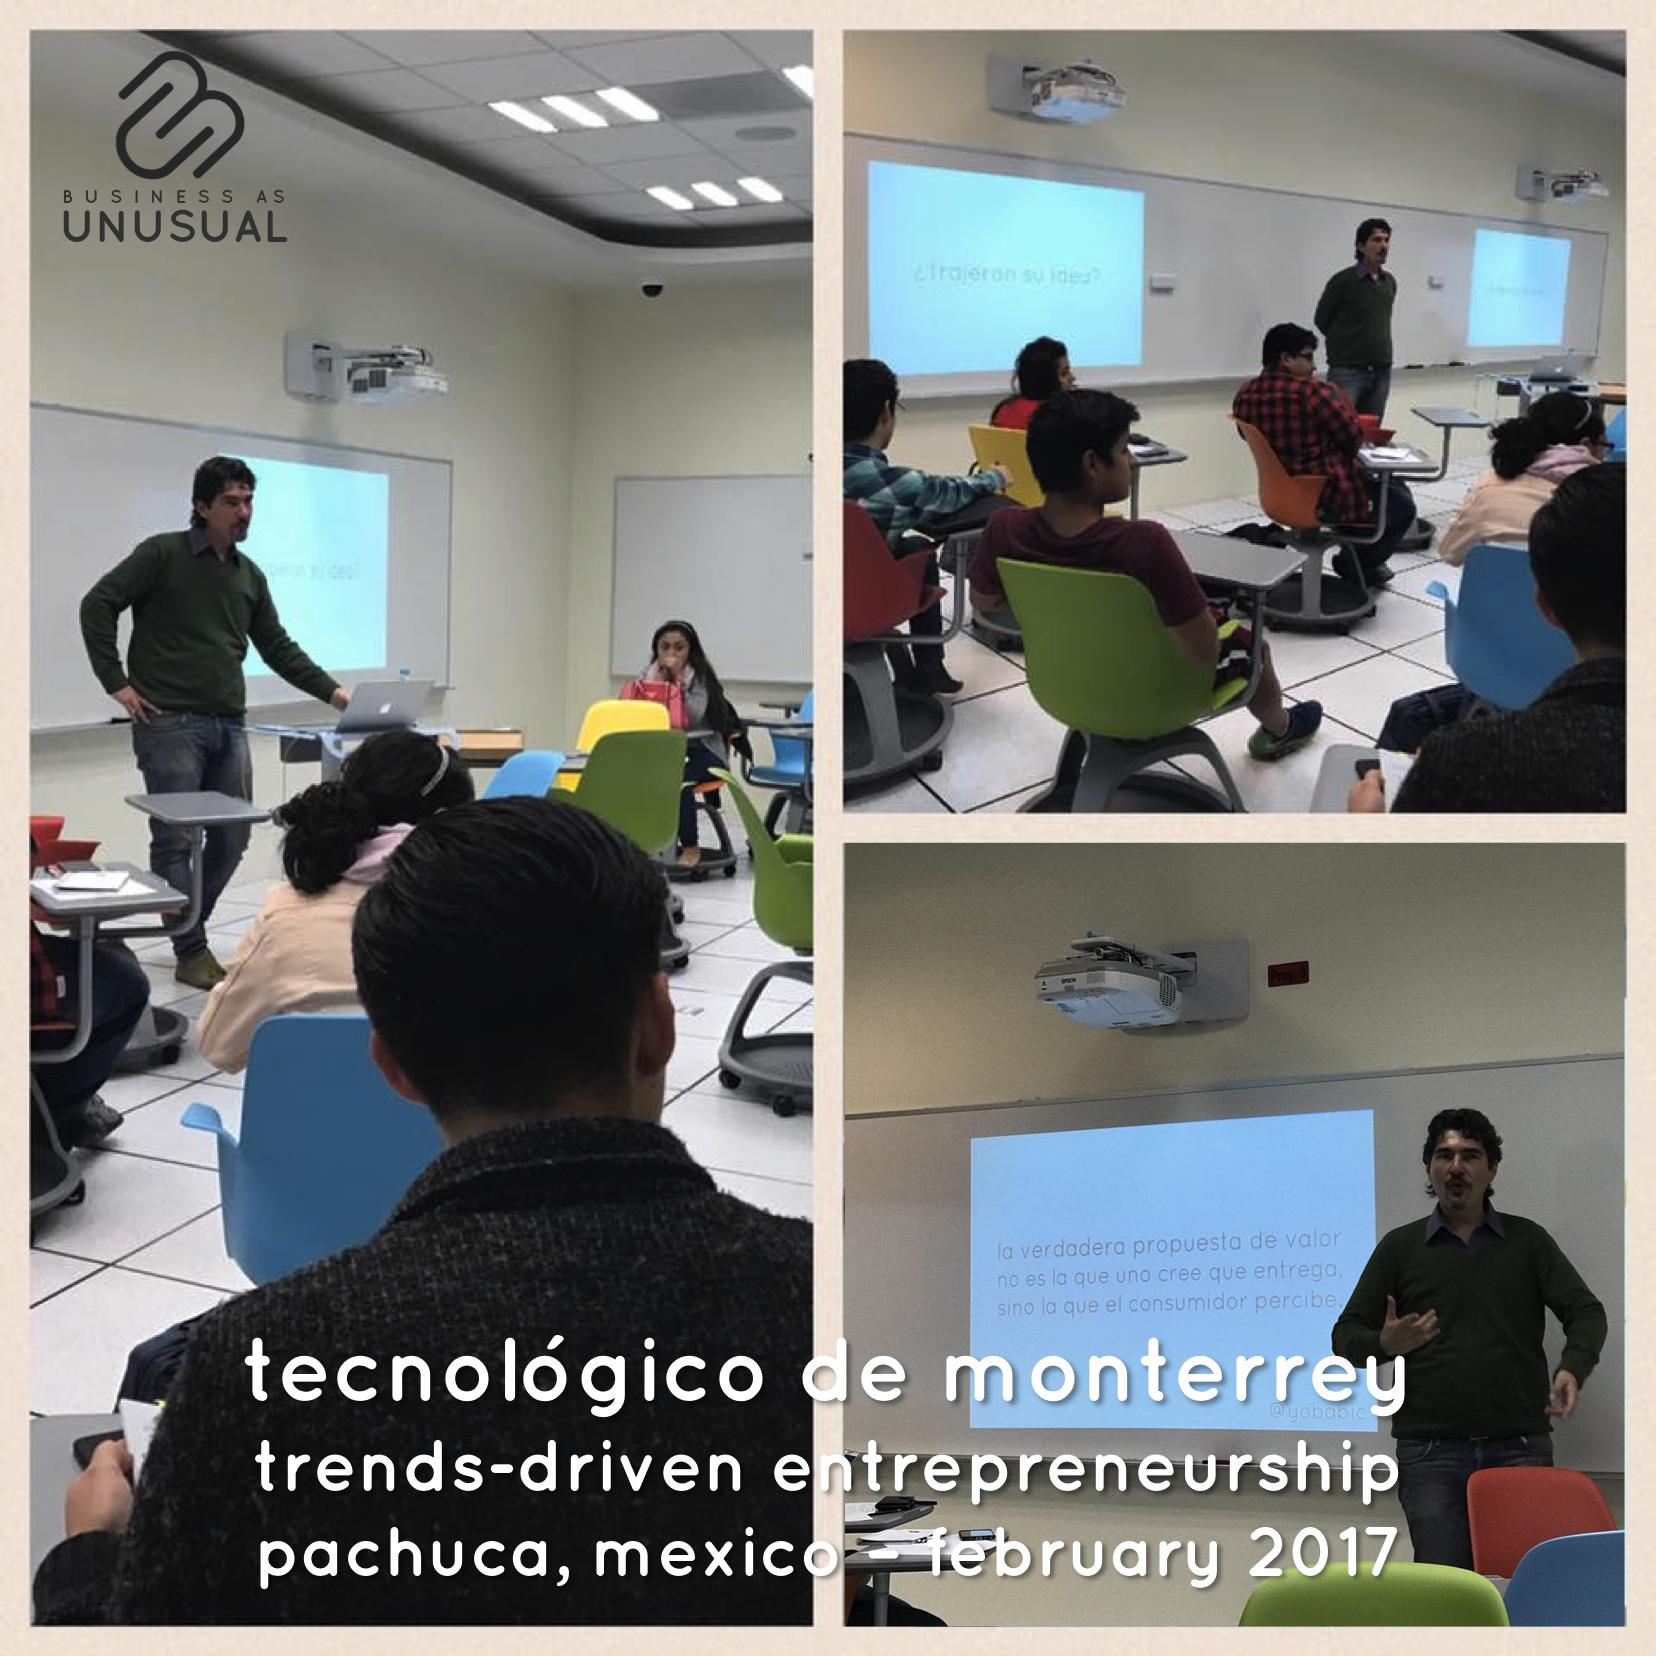 Instituto Tecnológico de Monterrey - Trends-Driven Entrepreneurship - Pachuca 2017